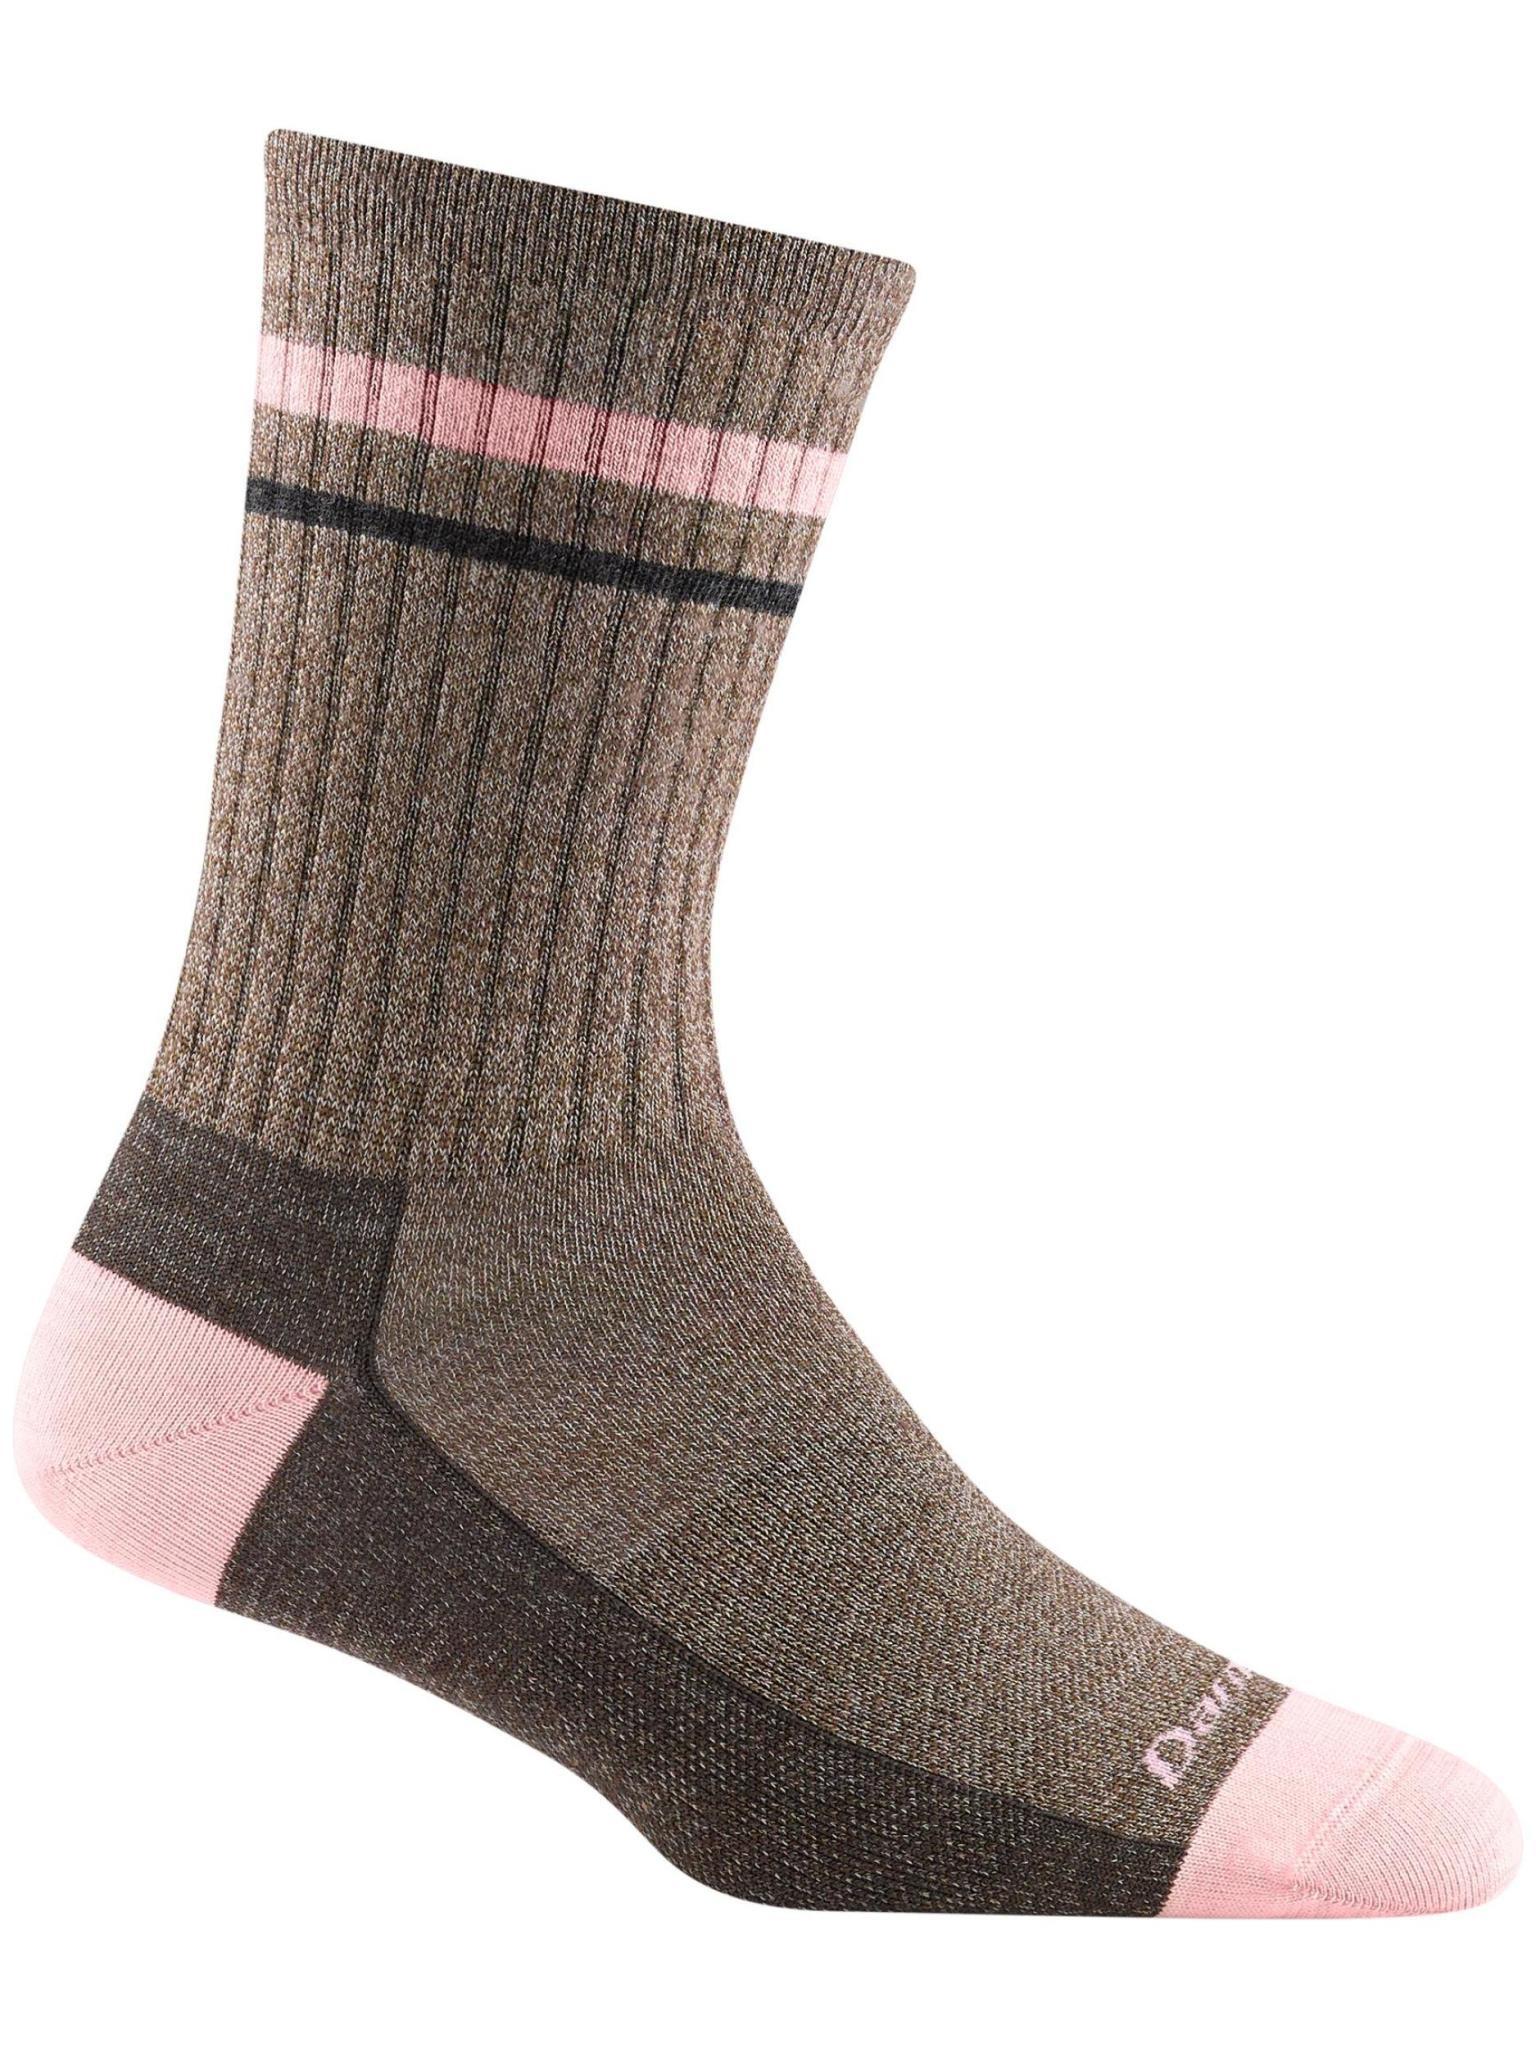 Darn Tough Women's Letterman Crew Lightweight Sock